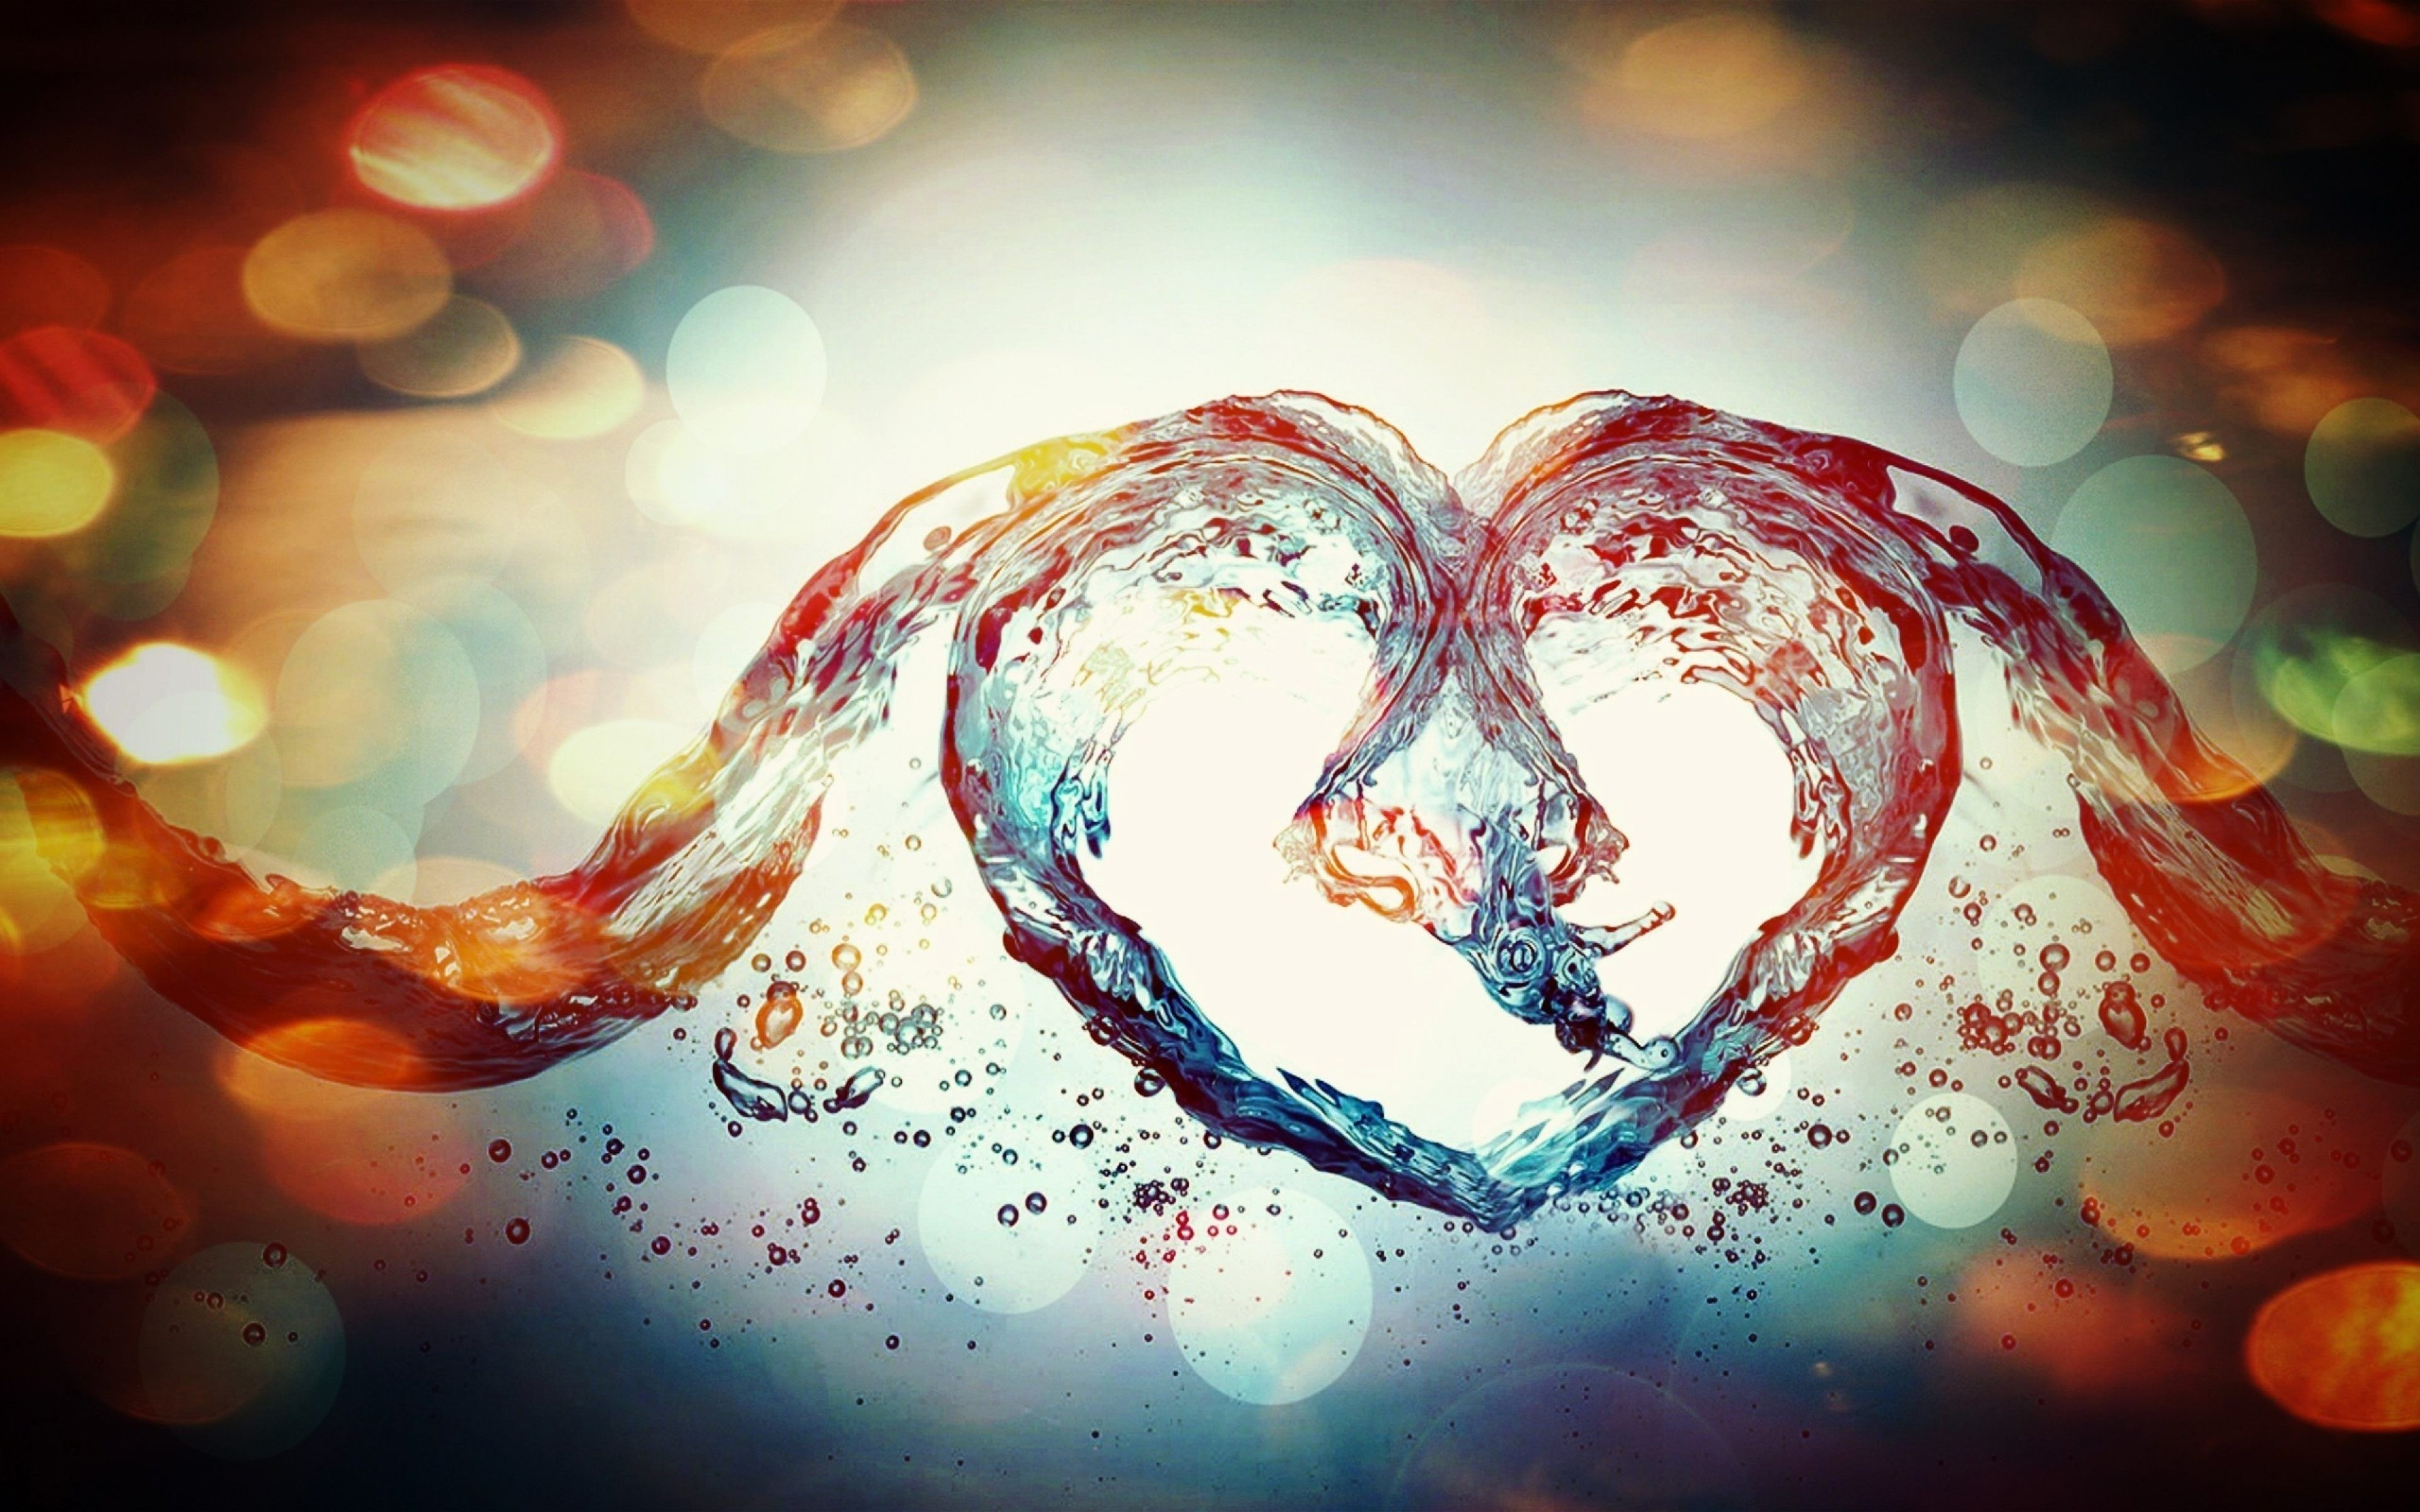 water heart love art 4k ultra hd wallpaper o oshenka